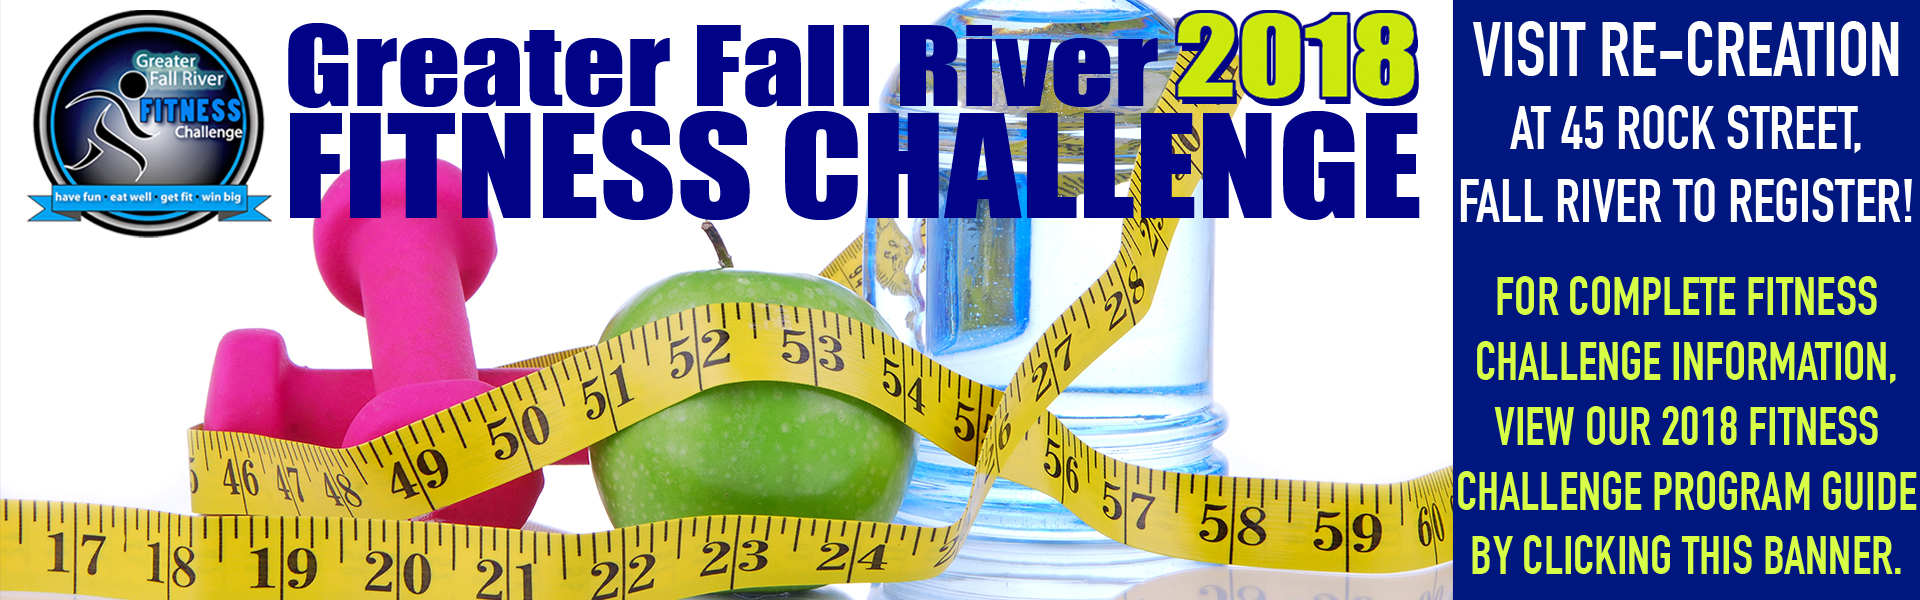 banner fitness challenge